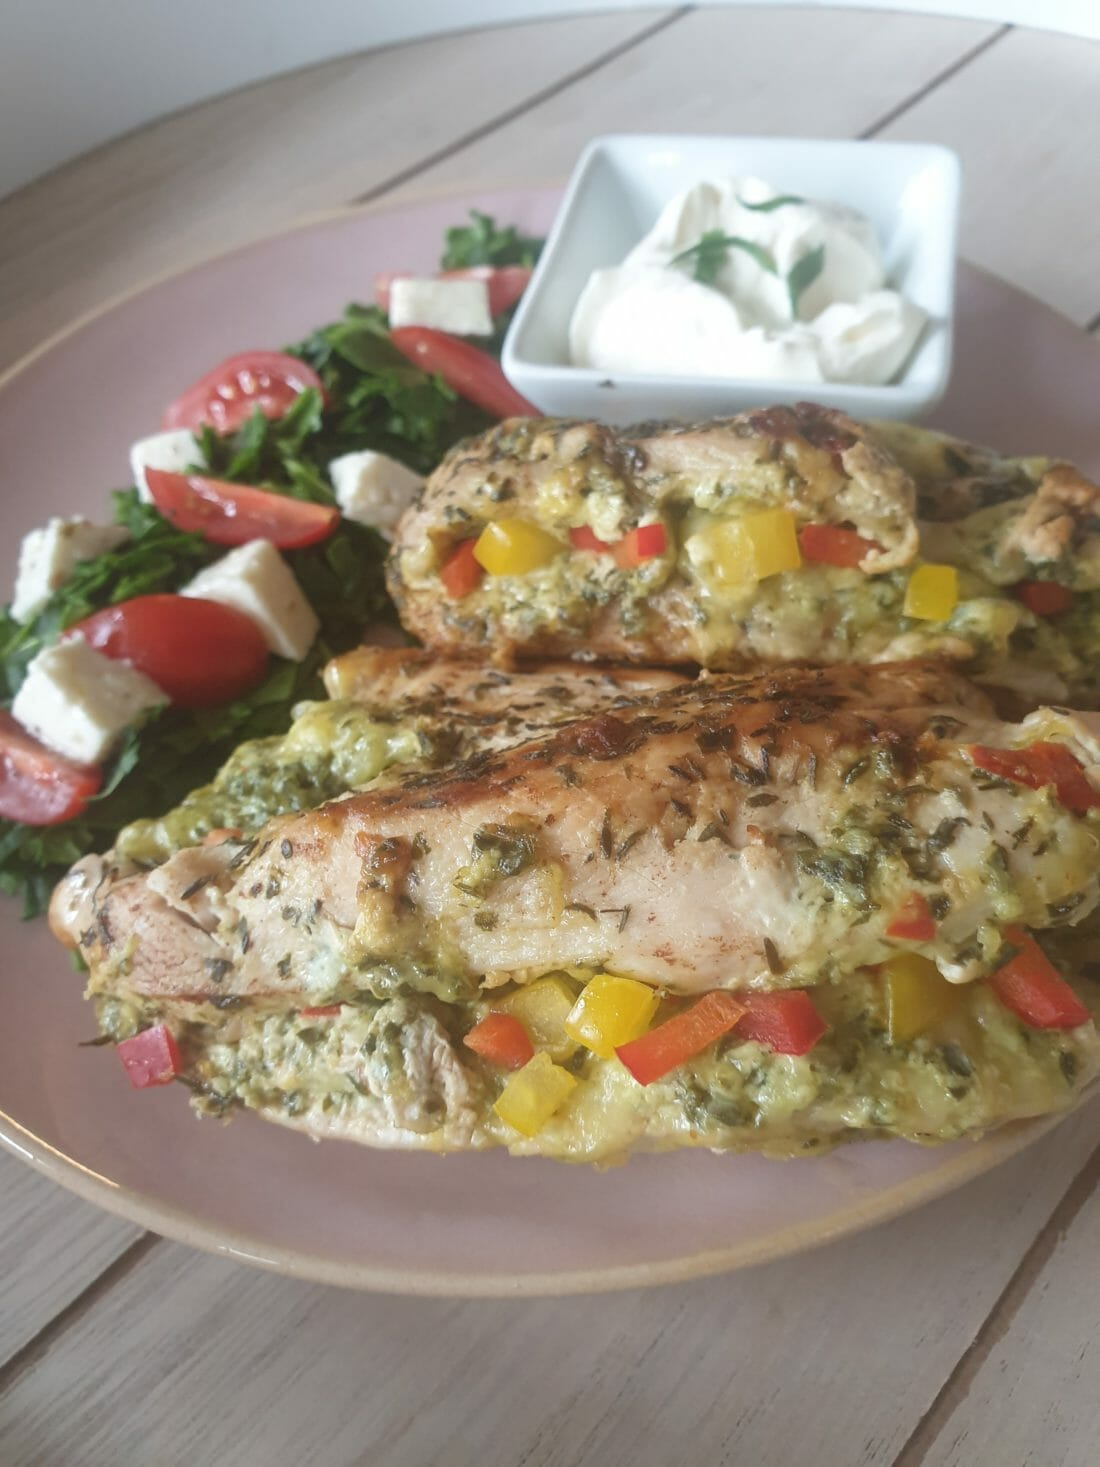 Kyllingfilet fylt med kremet spinat